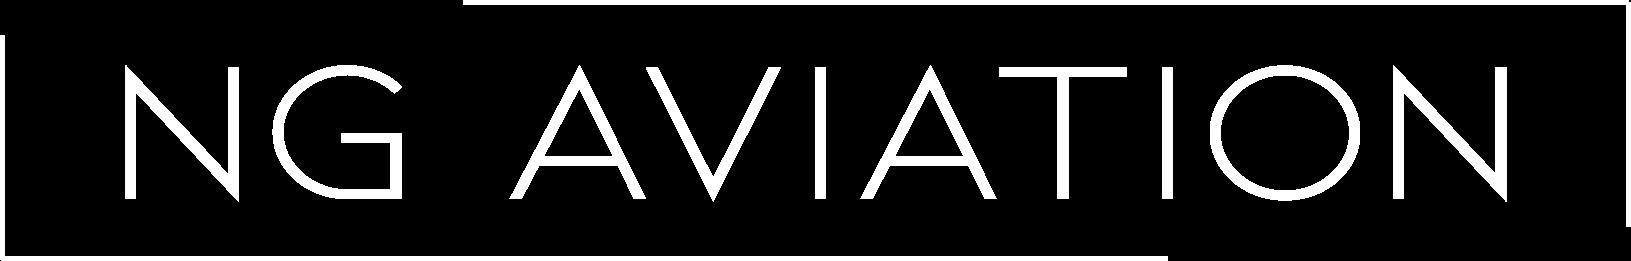 NG Aviation_Logo_White